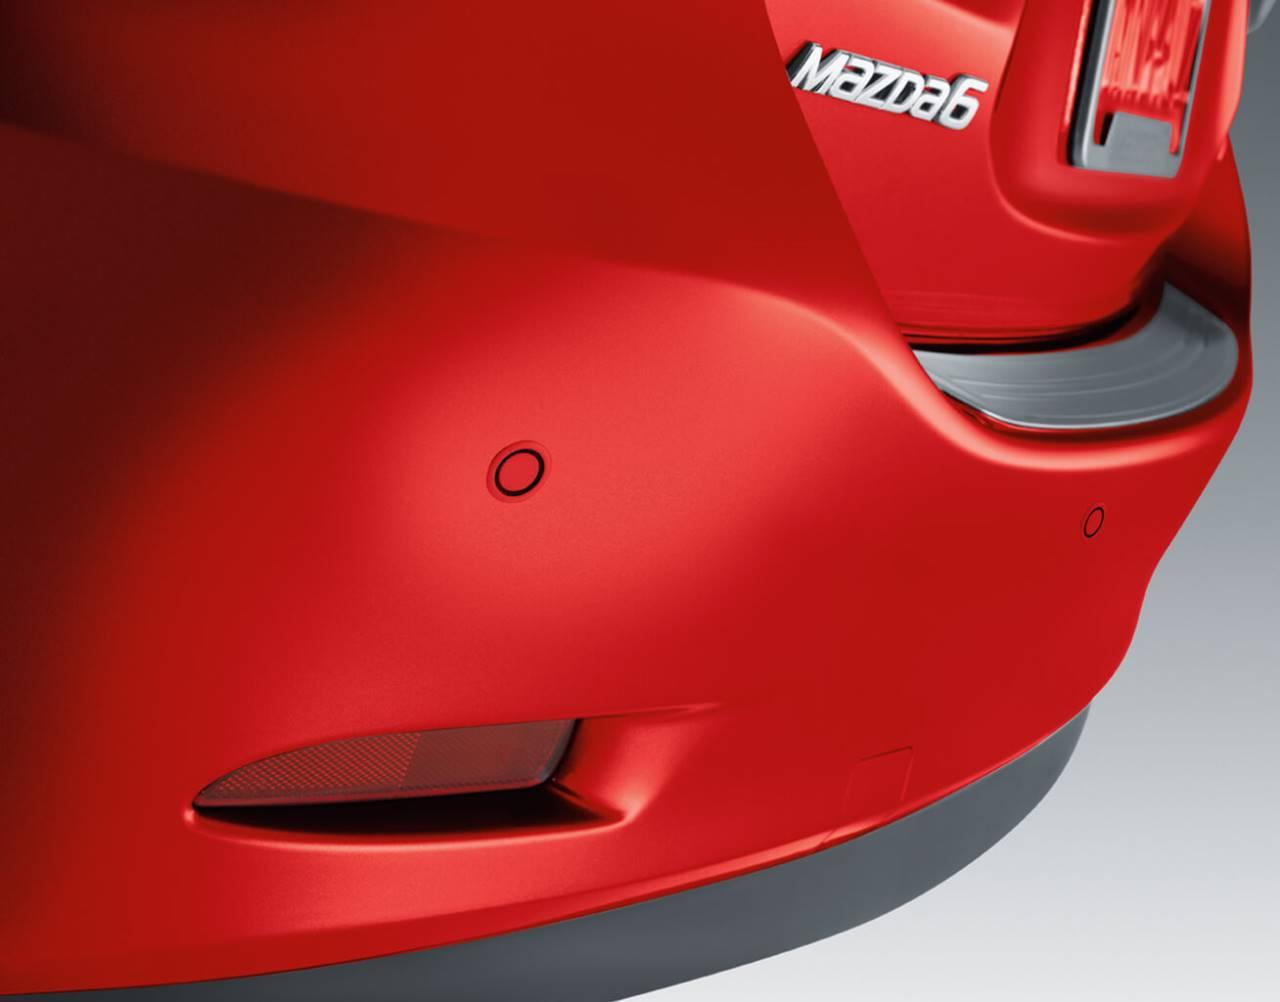 2018 Mazda6, REAR PARKING SENSORS<sup>*</sup>